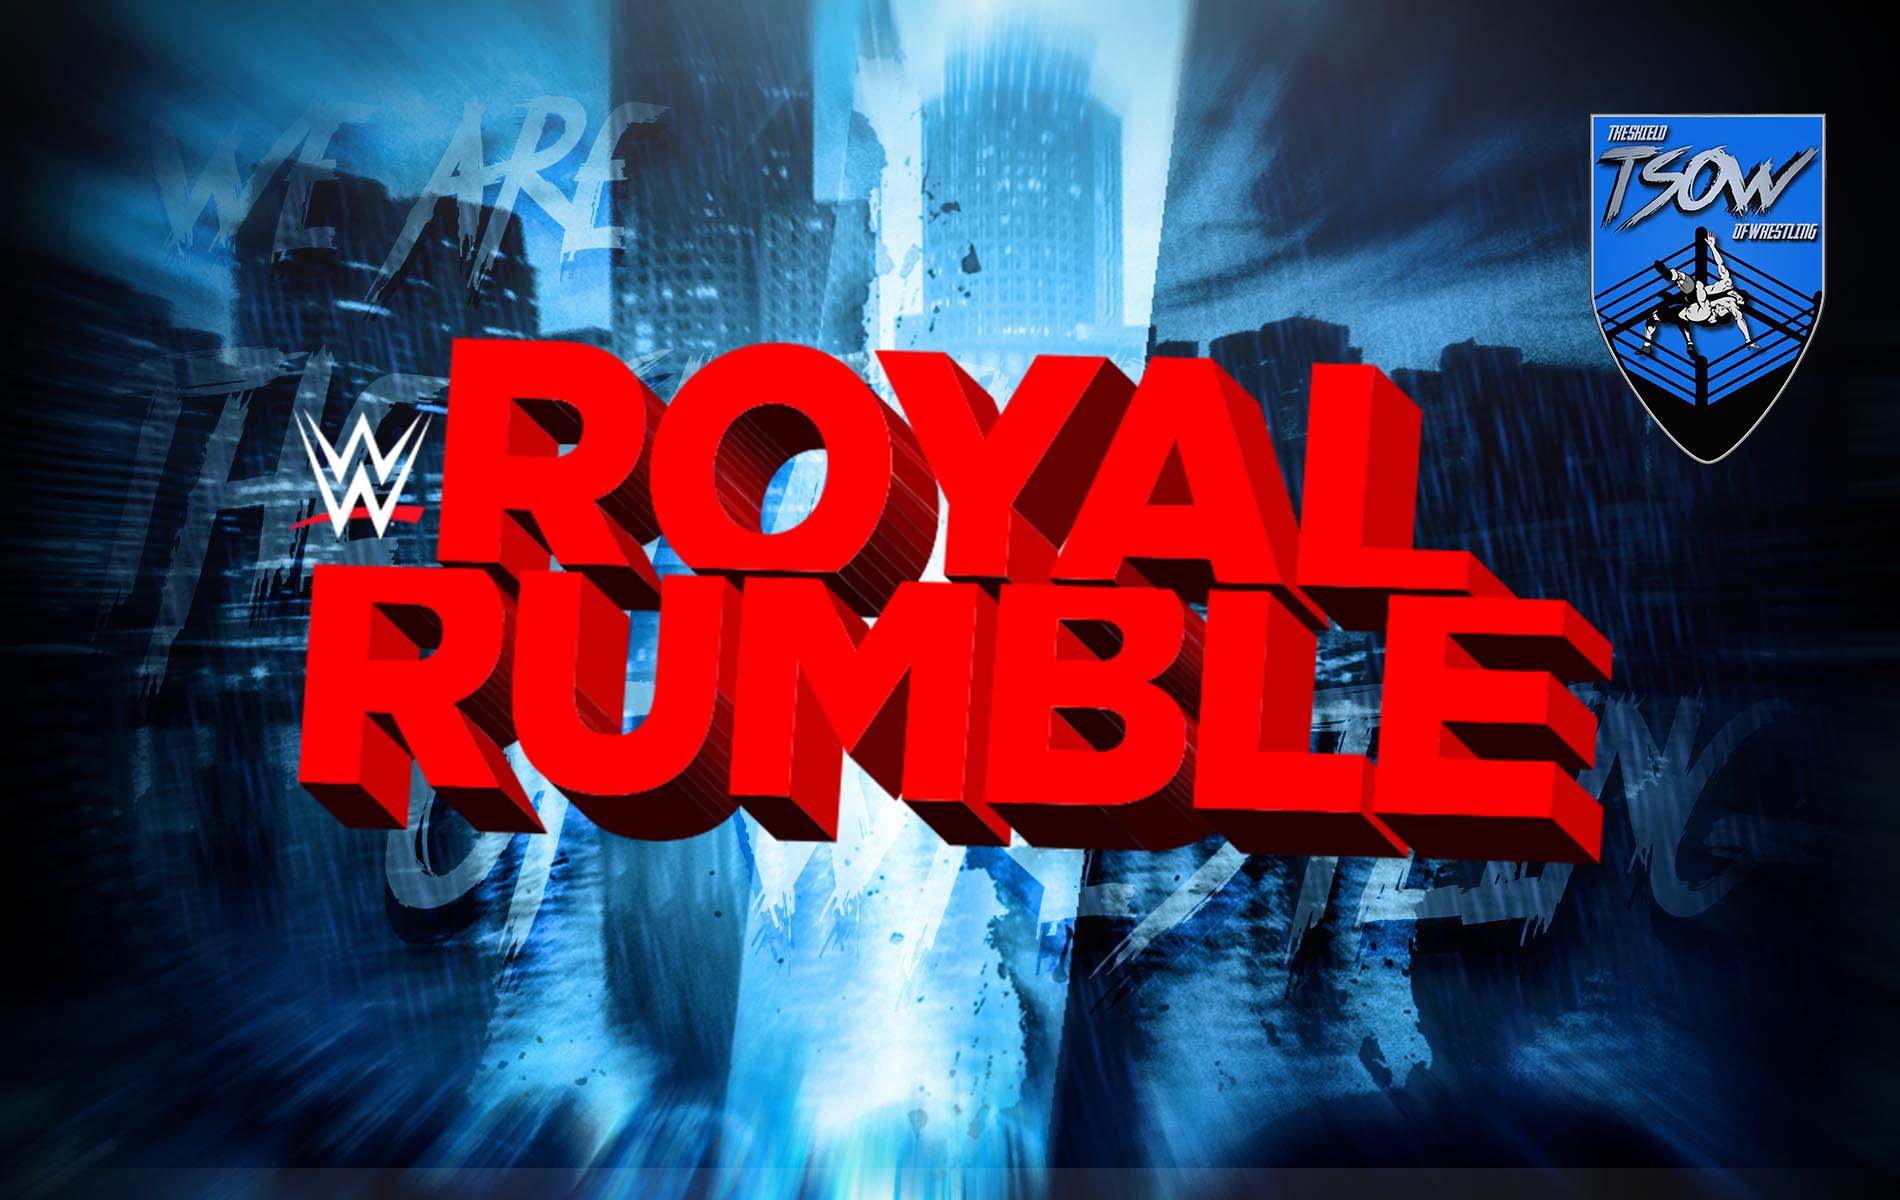 WWE Royal Rumble 2021 - Numeri, statistiche e curiosità